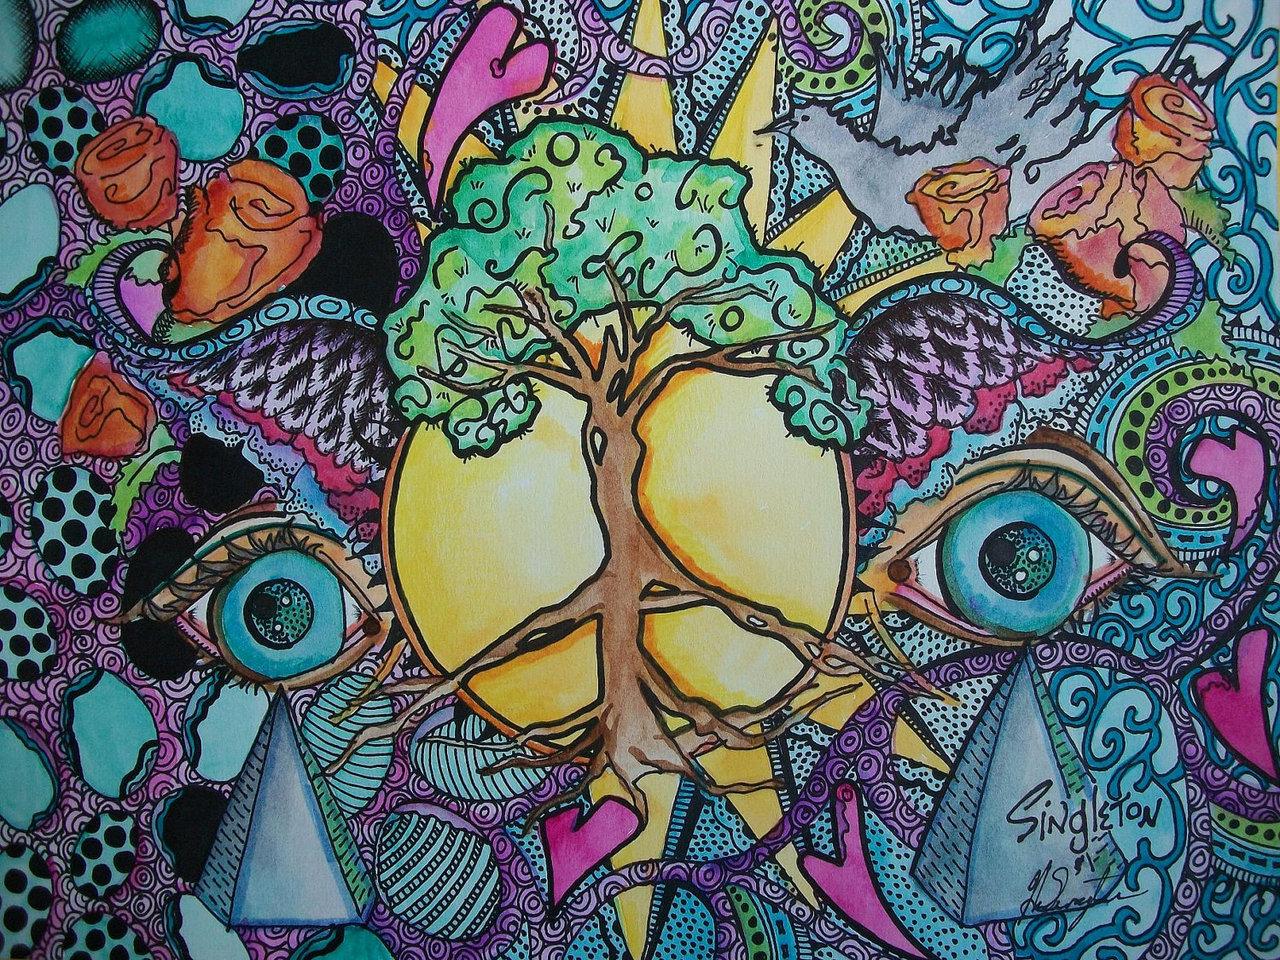 trippy hippie pictures tumblr